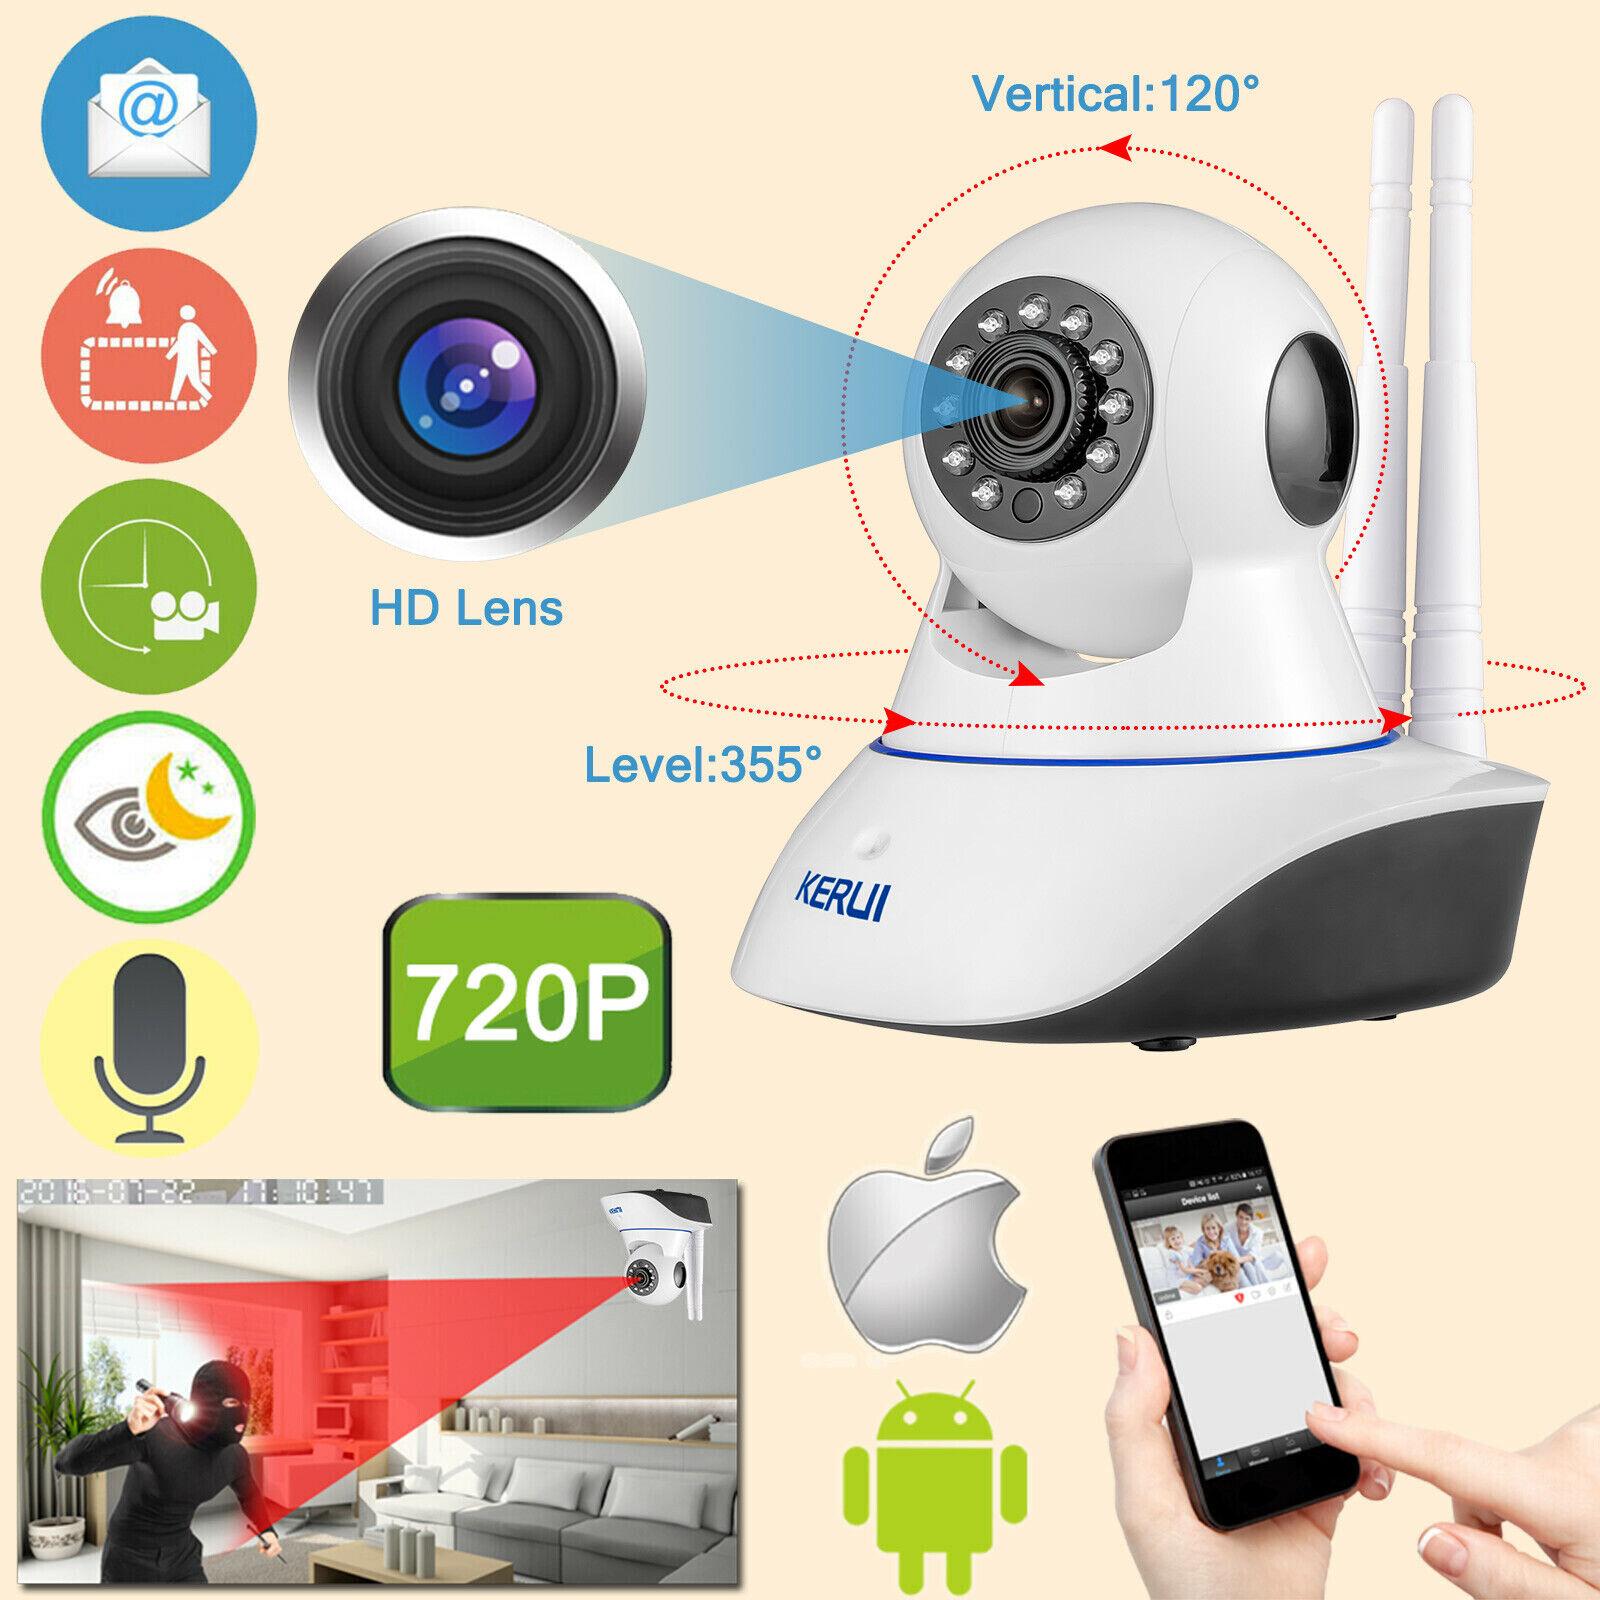 KERUI N62 WIFI IP Camera Wireless Smart Security Alarm System Motion PIR Sensor